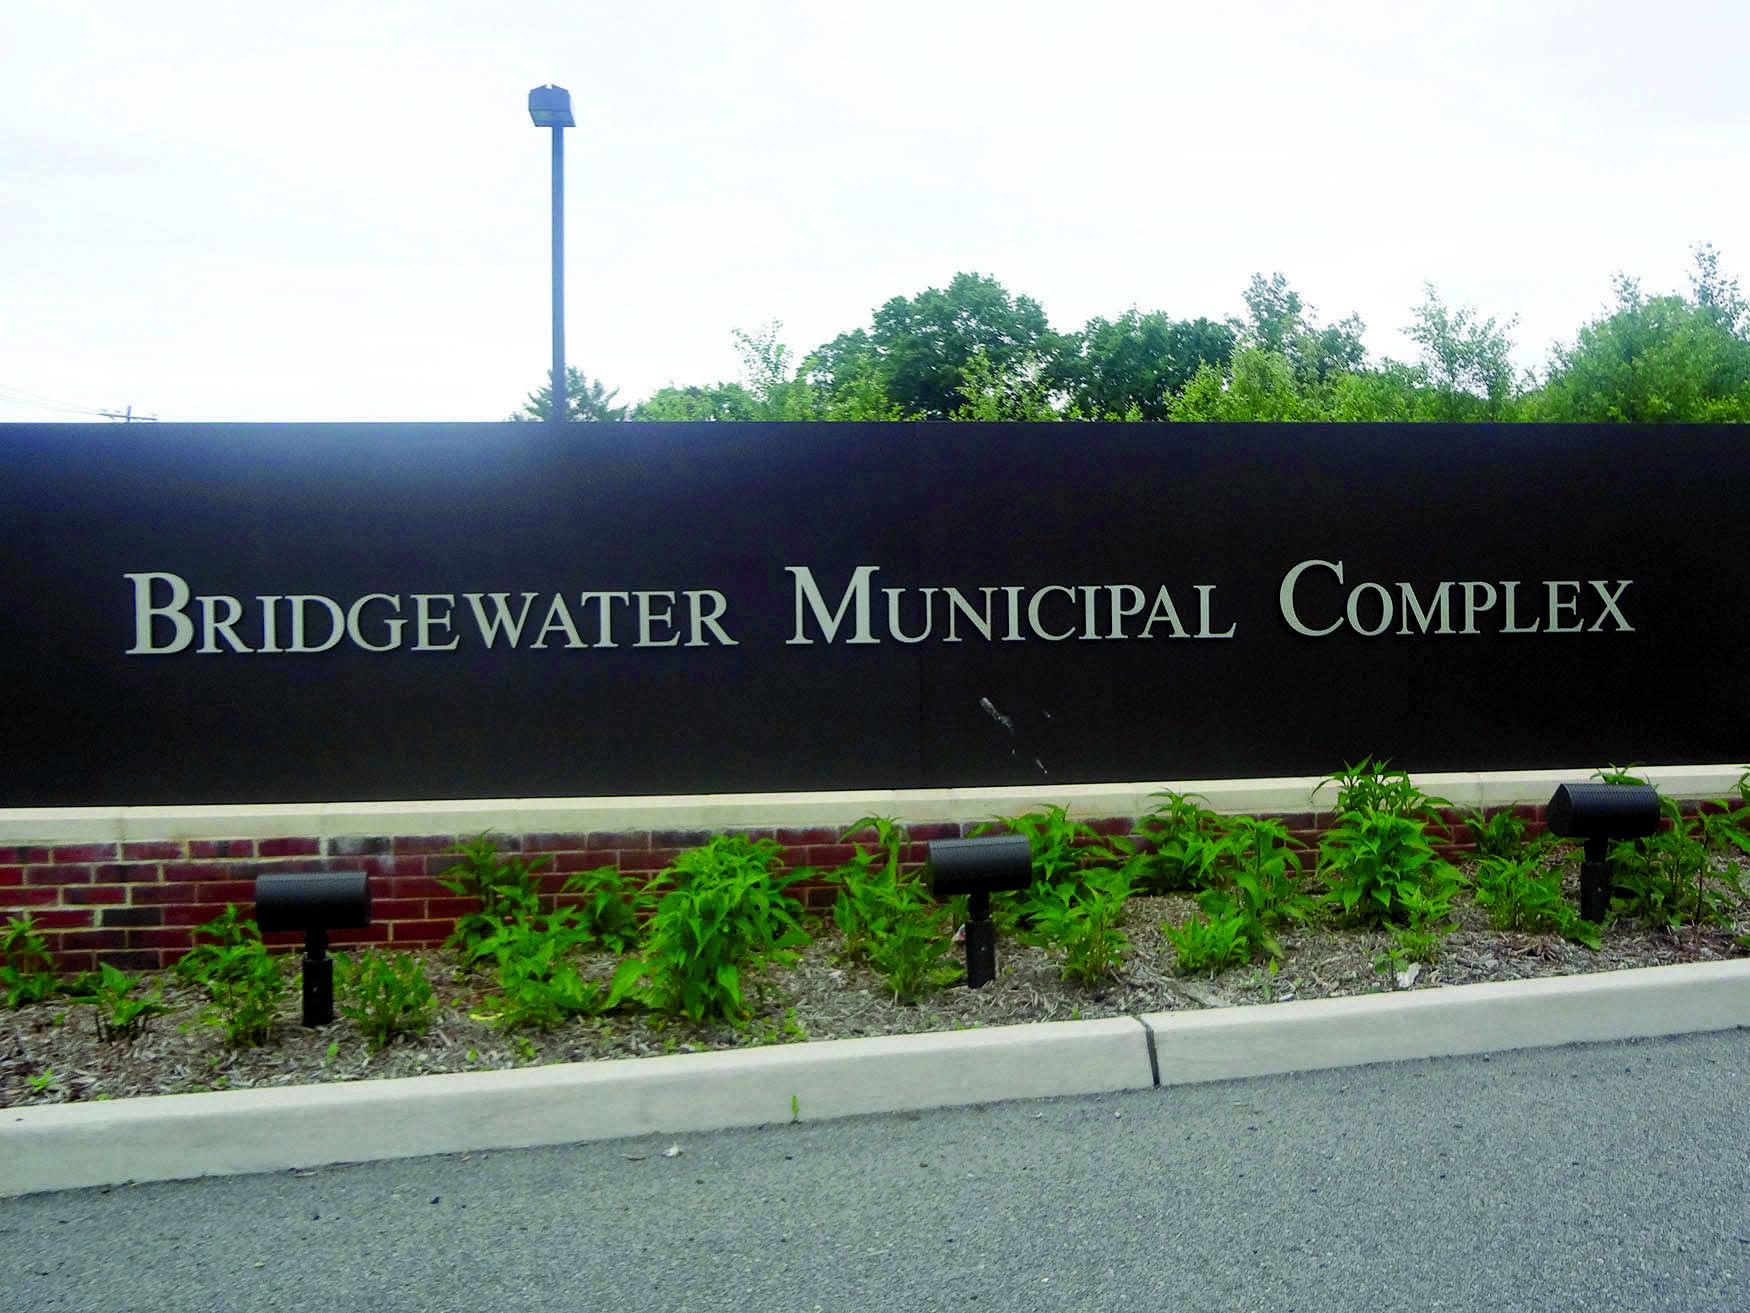 3791f347d567cbec4c9c_Bridgewater_municipal.jpg